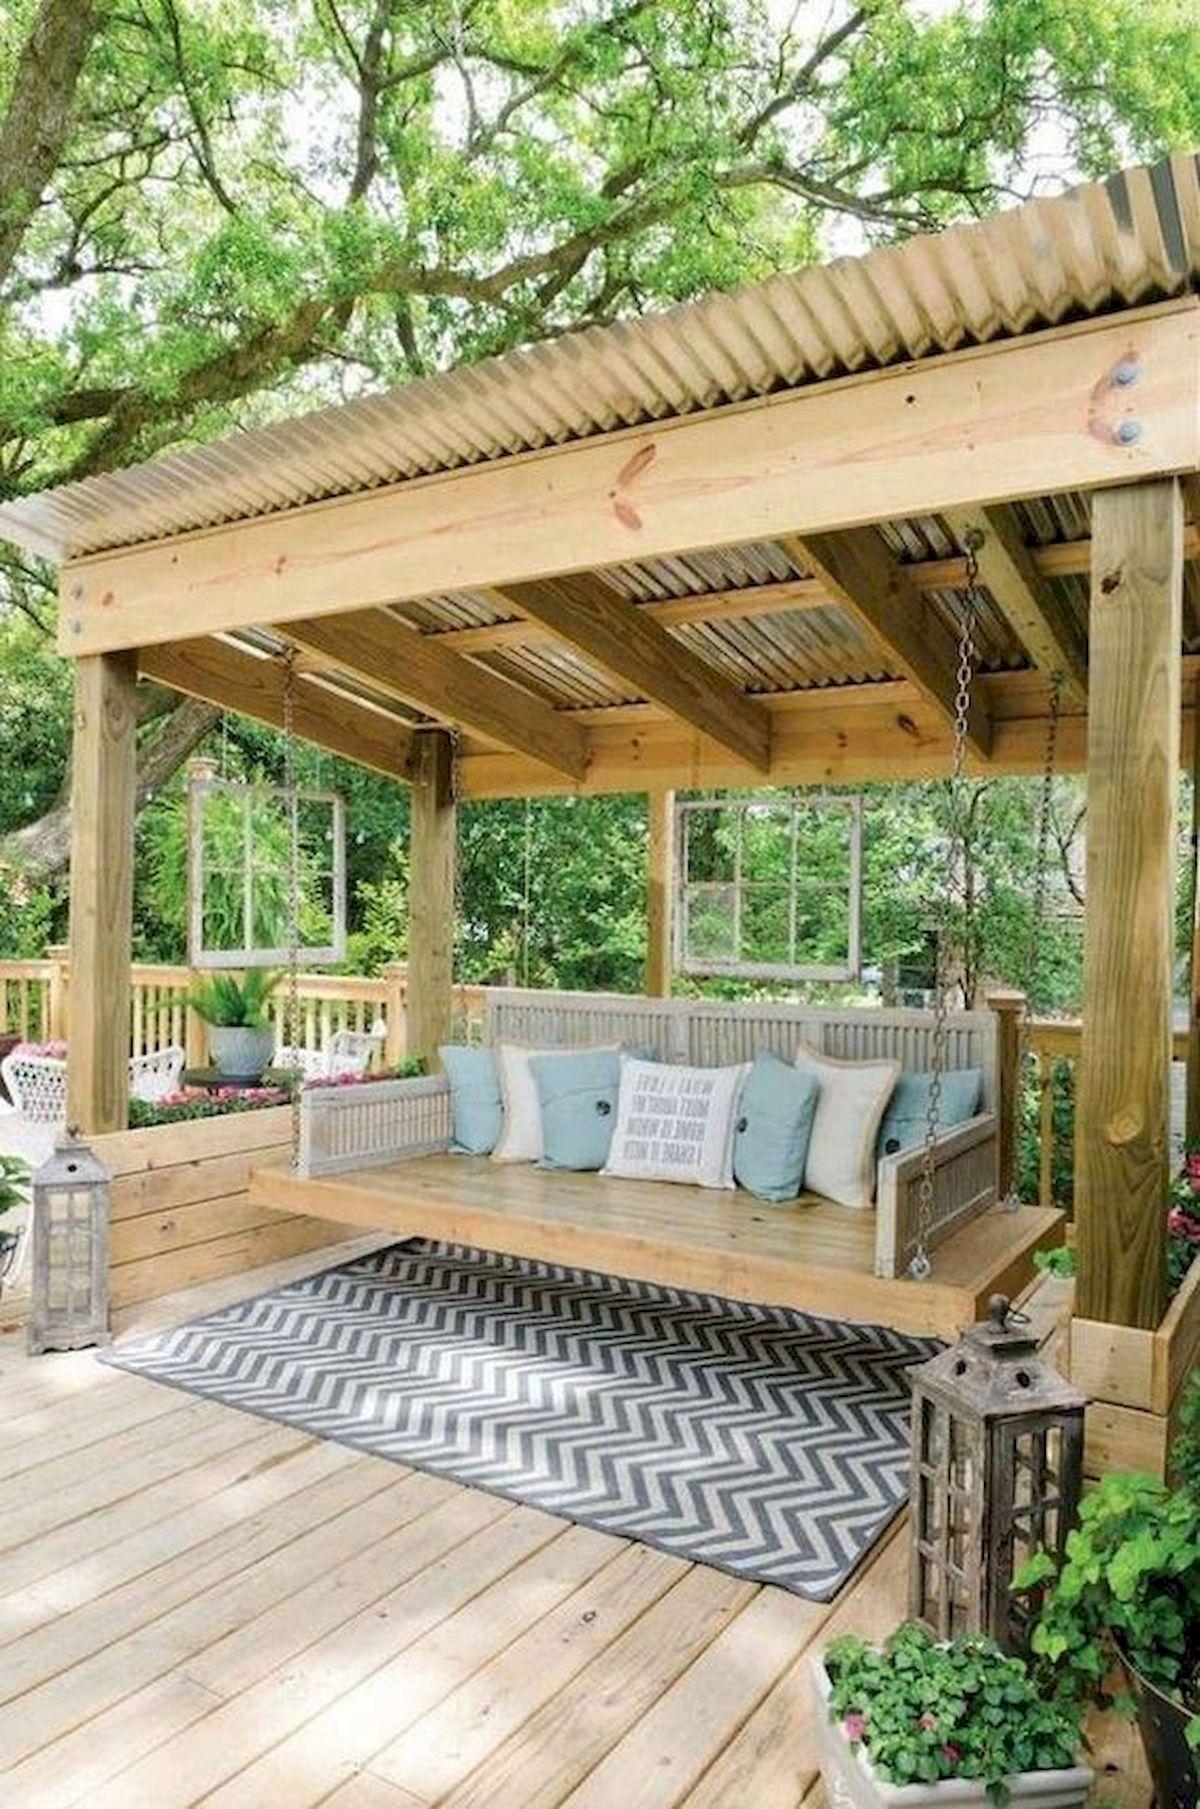 50 Fantastic Backyard Patio and Decking Design Ideas (45)